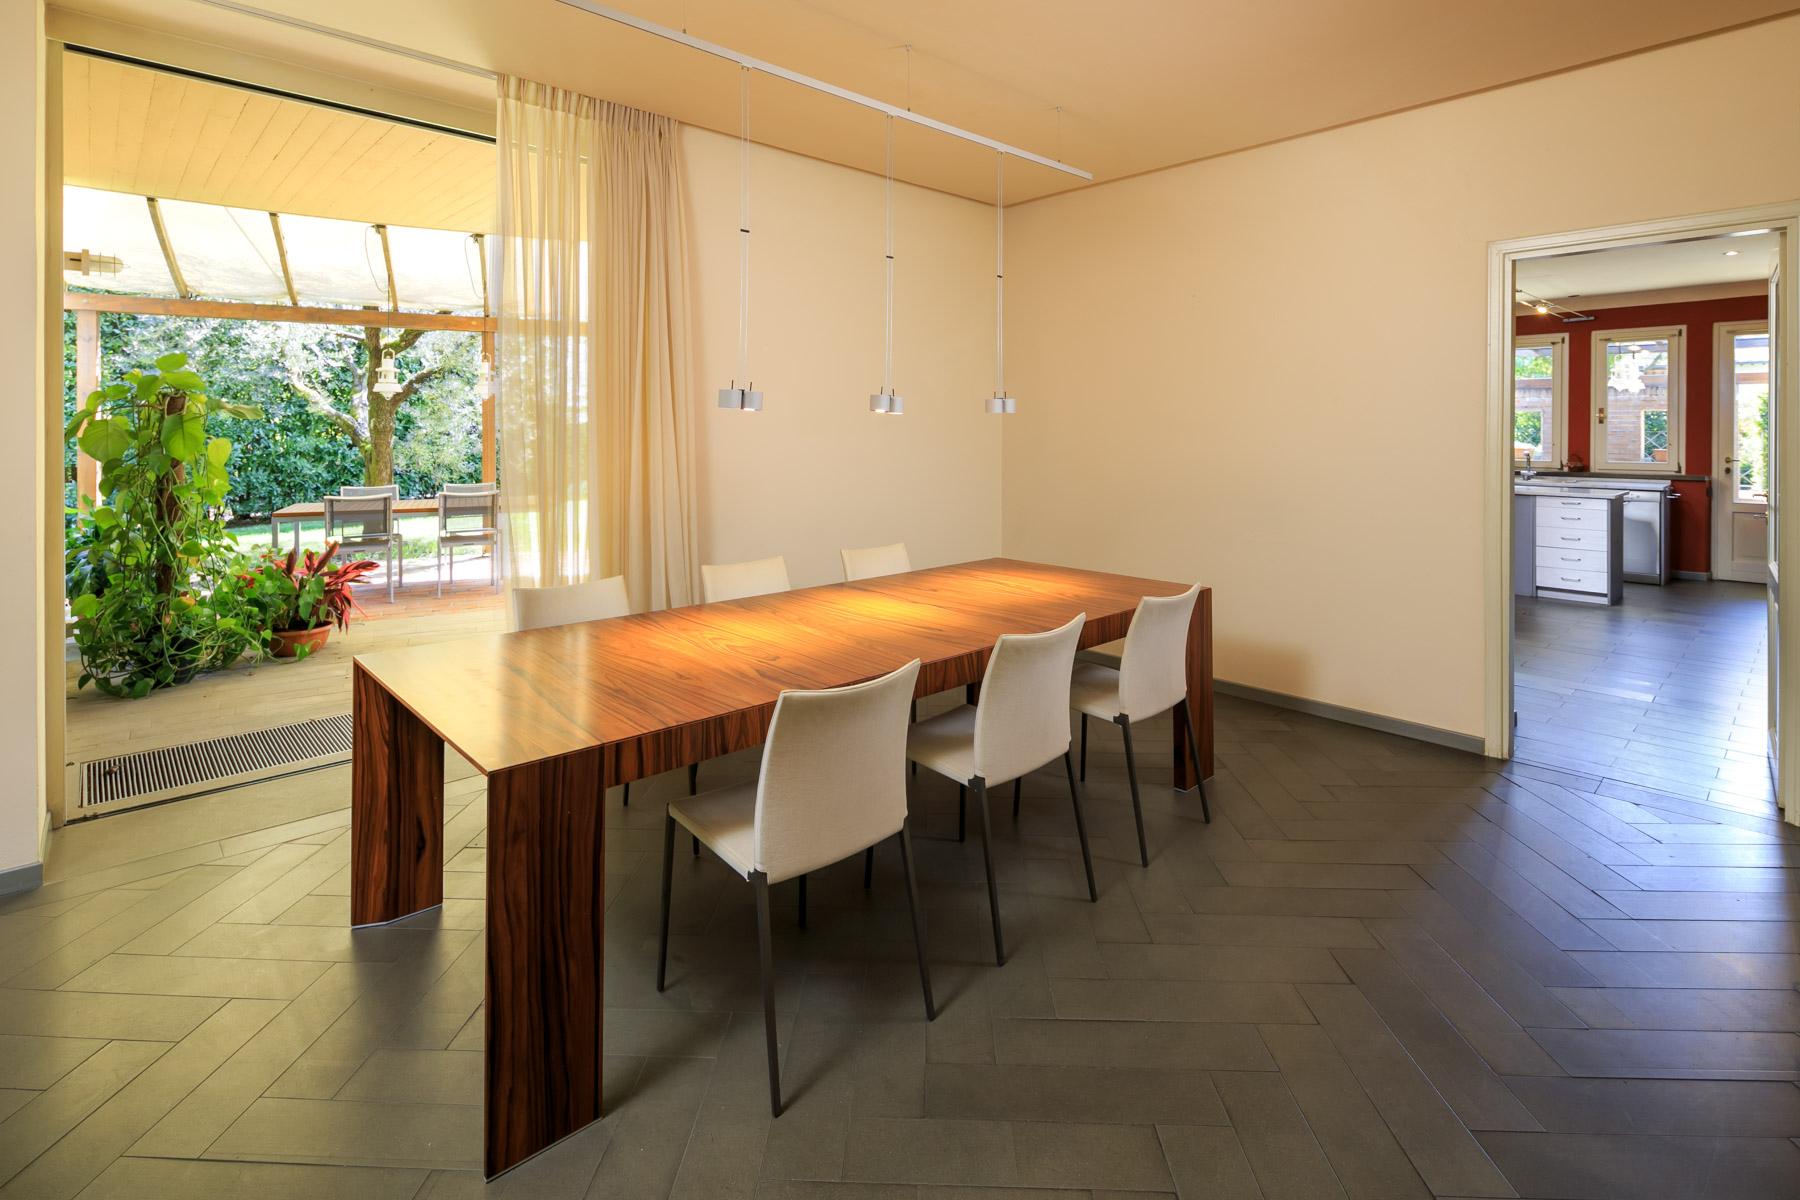 Villa in Vendita a Lucca: 5 locali, 500 mq - Foto 7